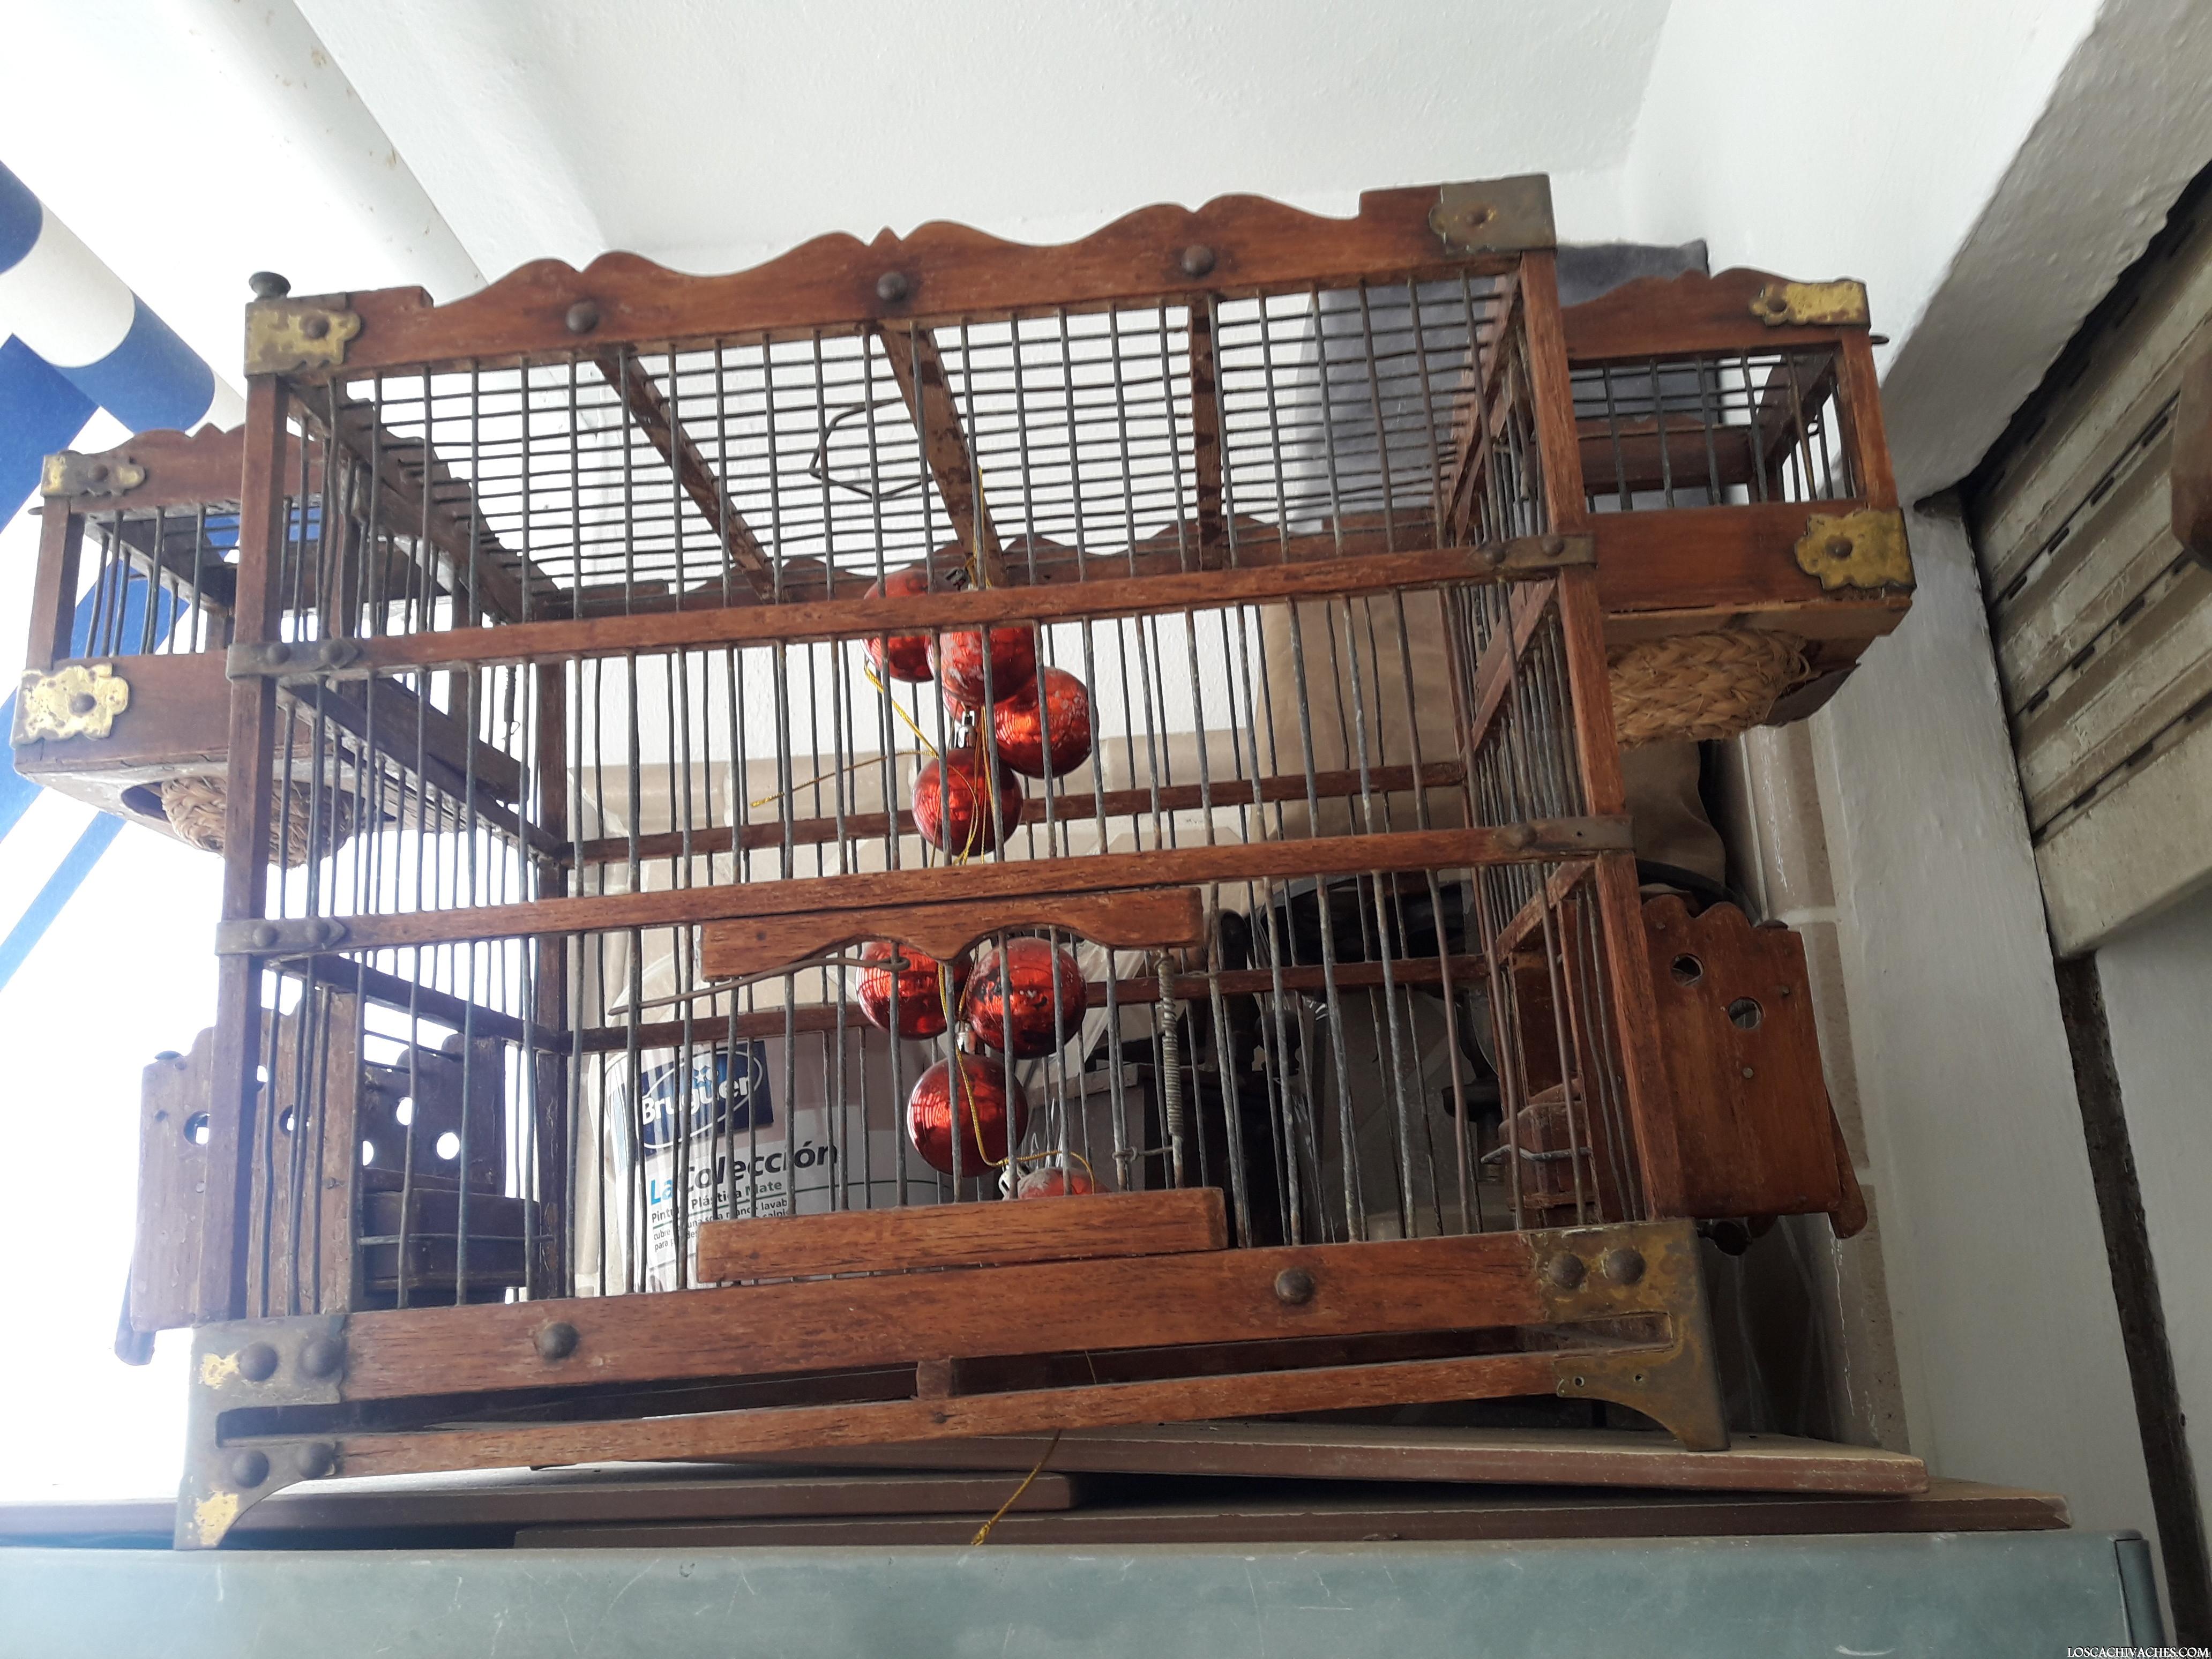 jaula de madera,pajaros,antiguo,criaderos